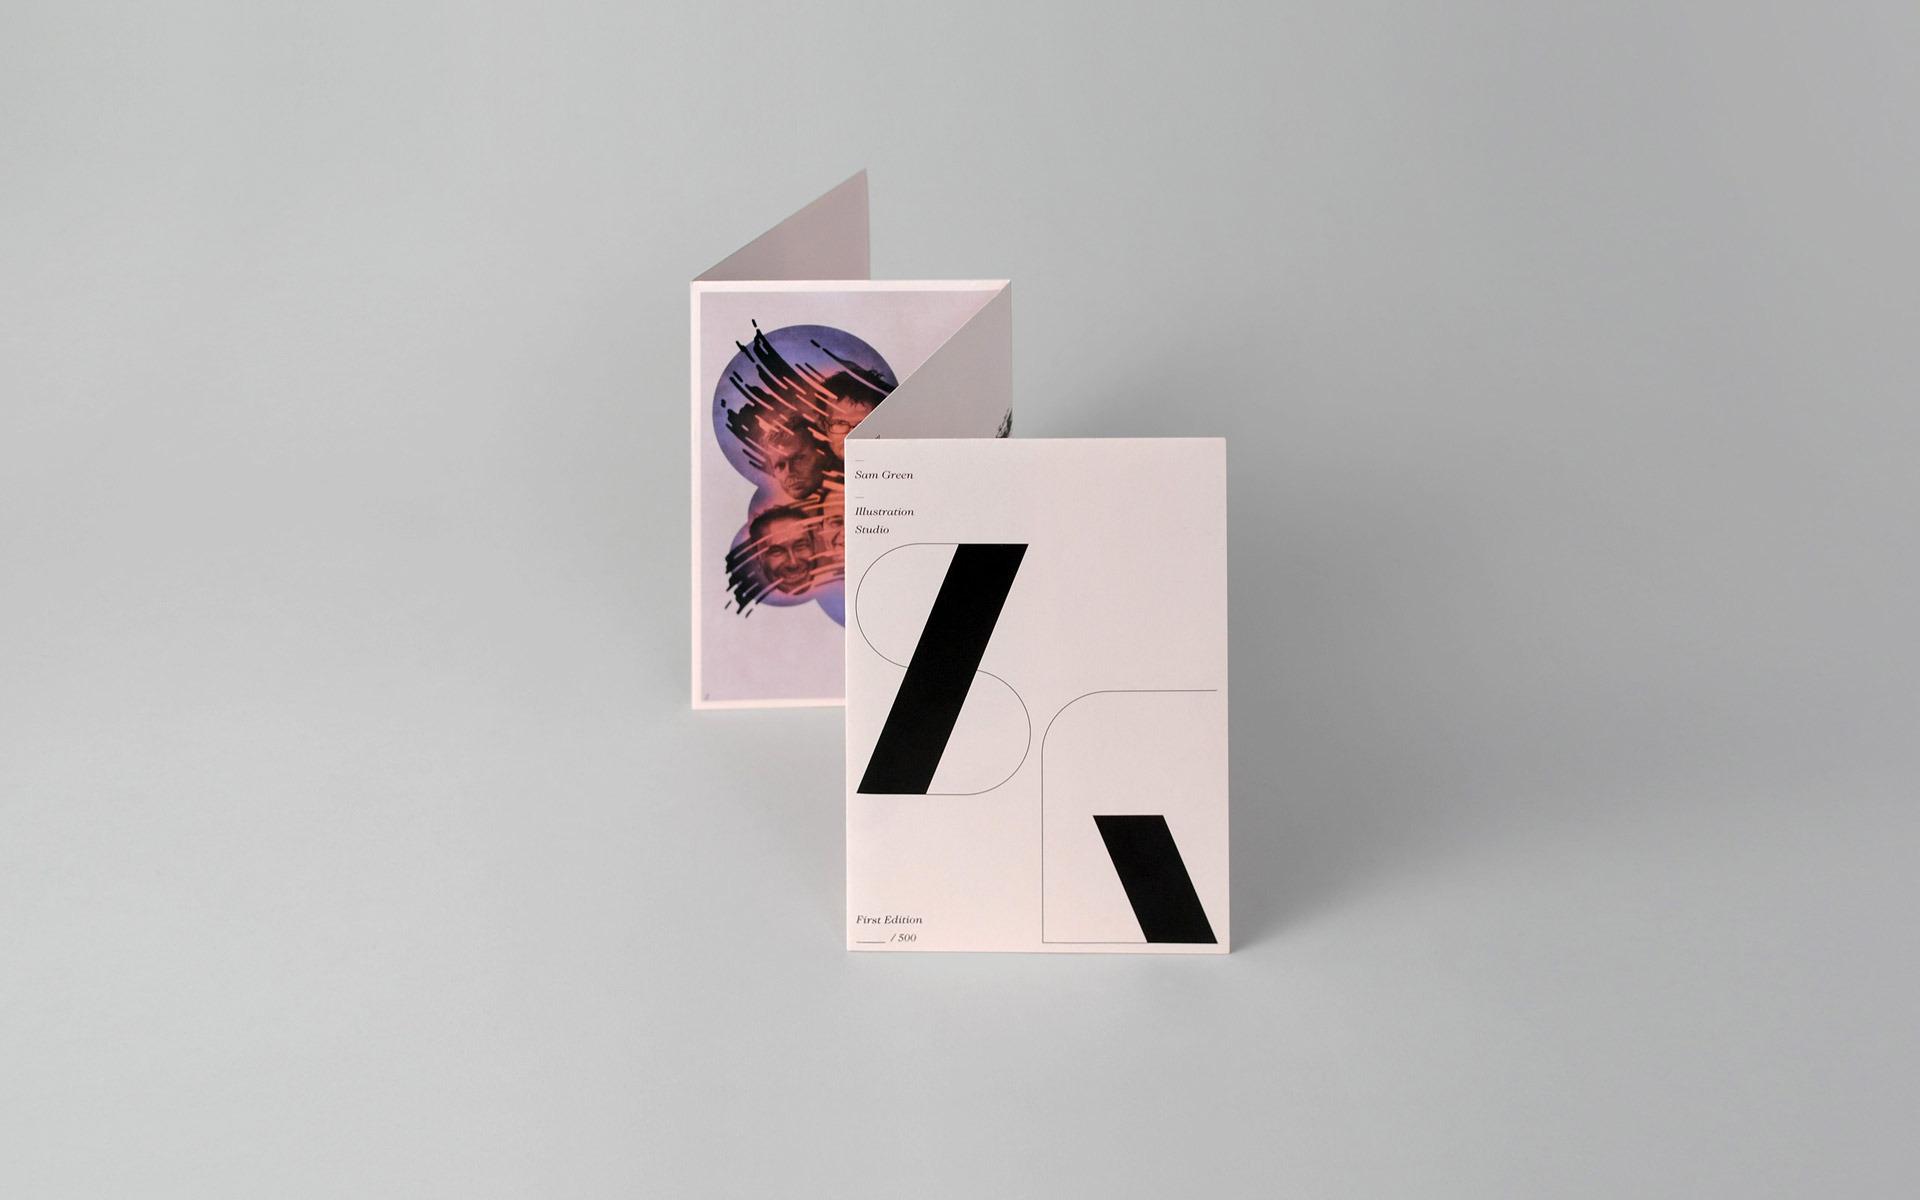 Sawdust — Work, Sam Green